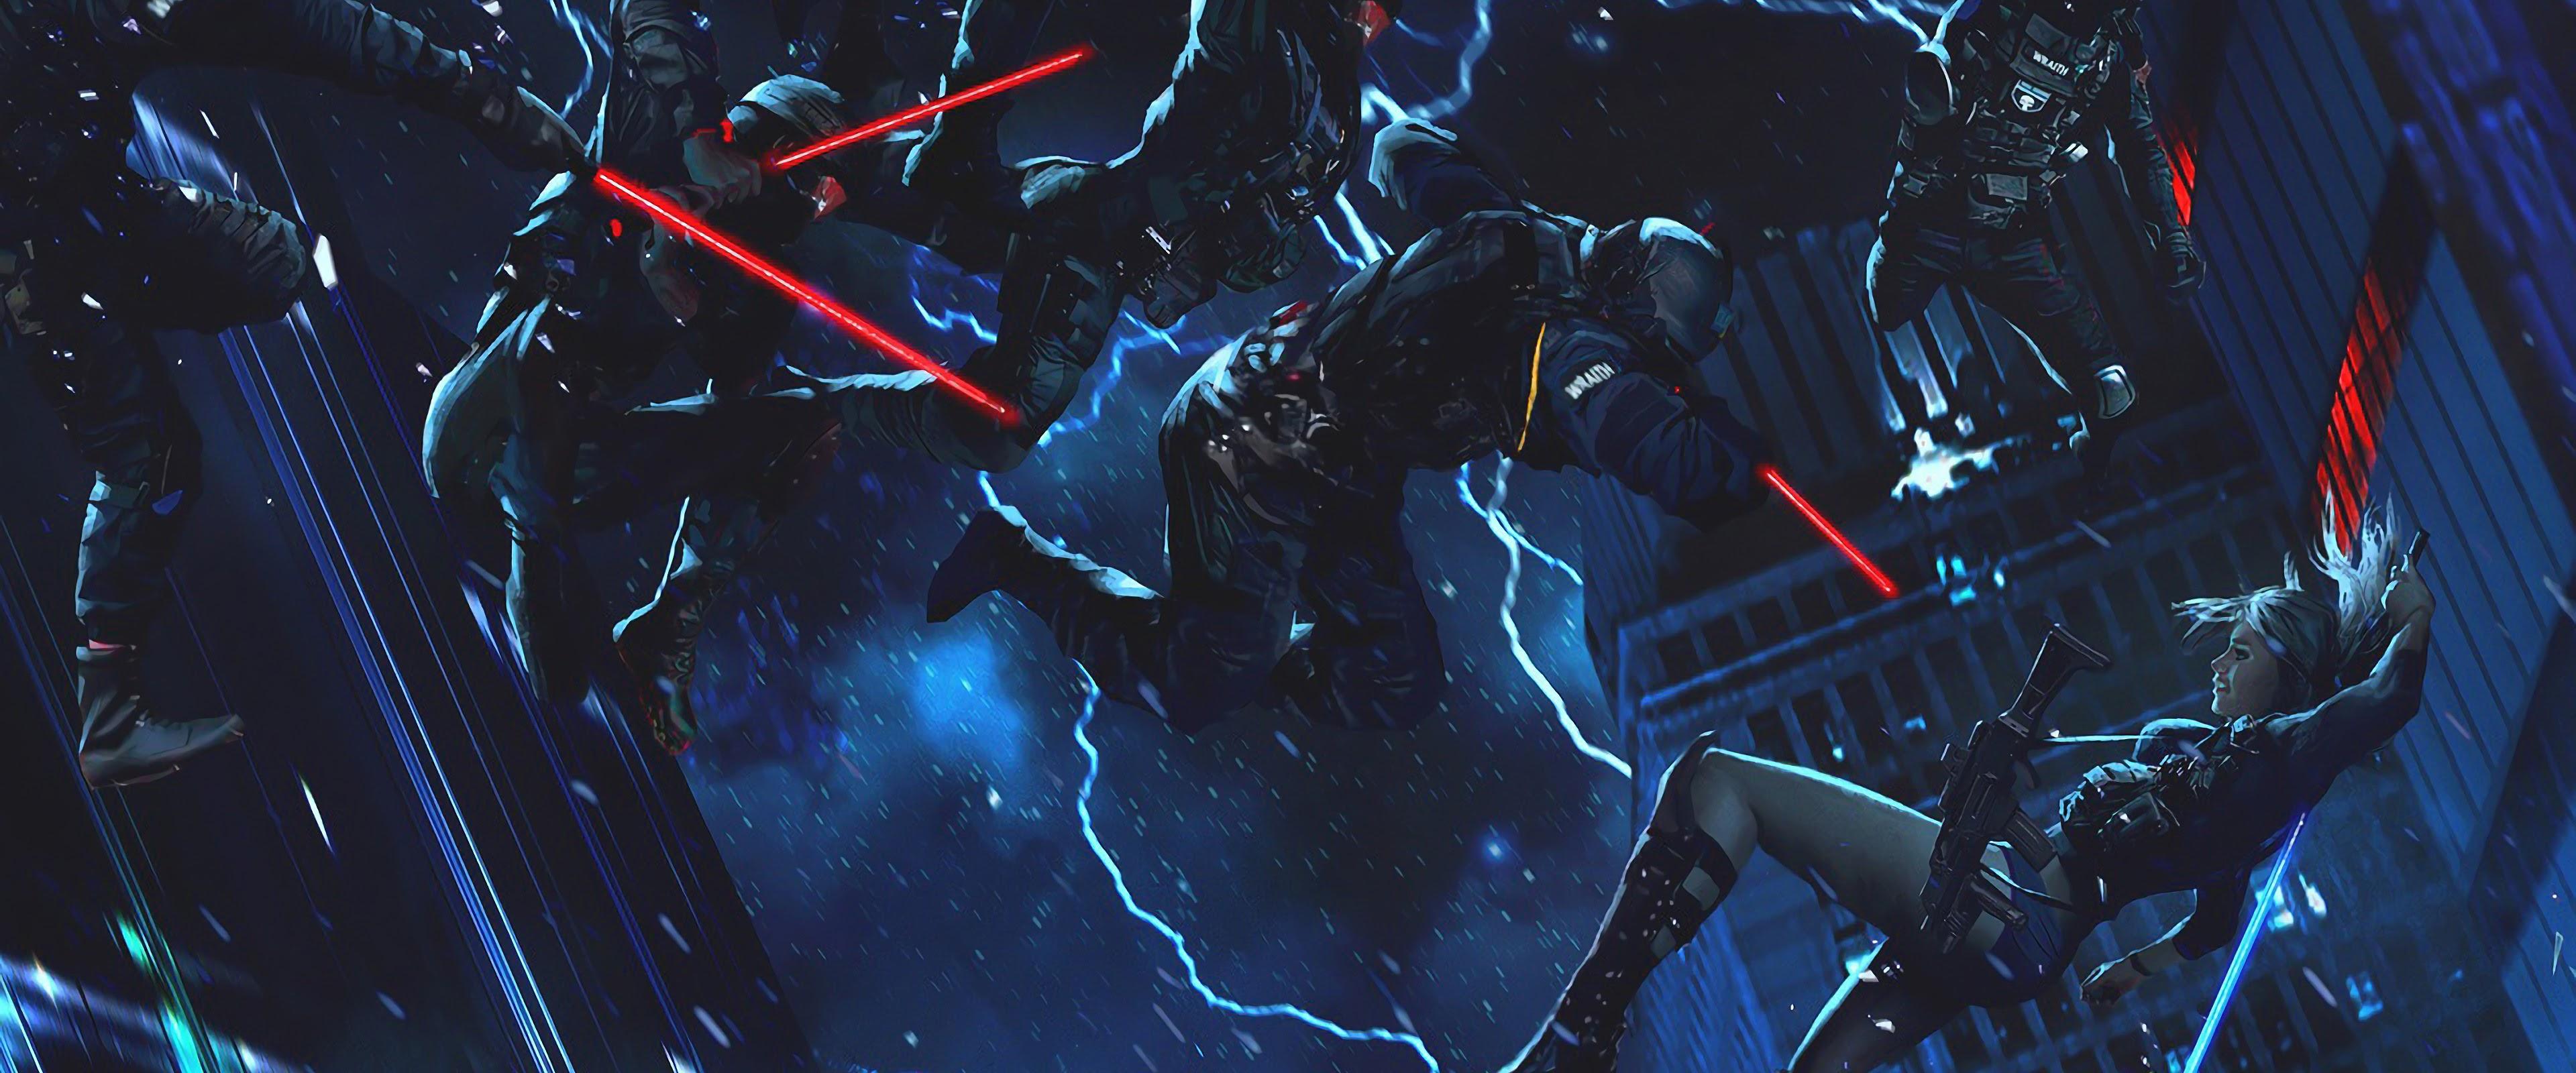 Sci Fi Soldiers Lightsaber Cyberpunk 4k Wallpaper 67